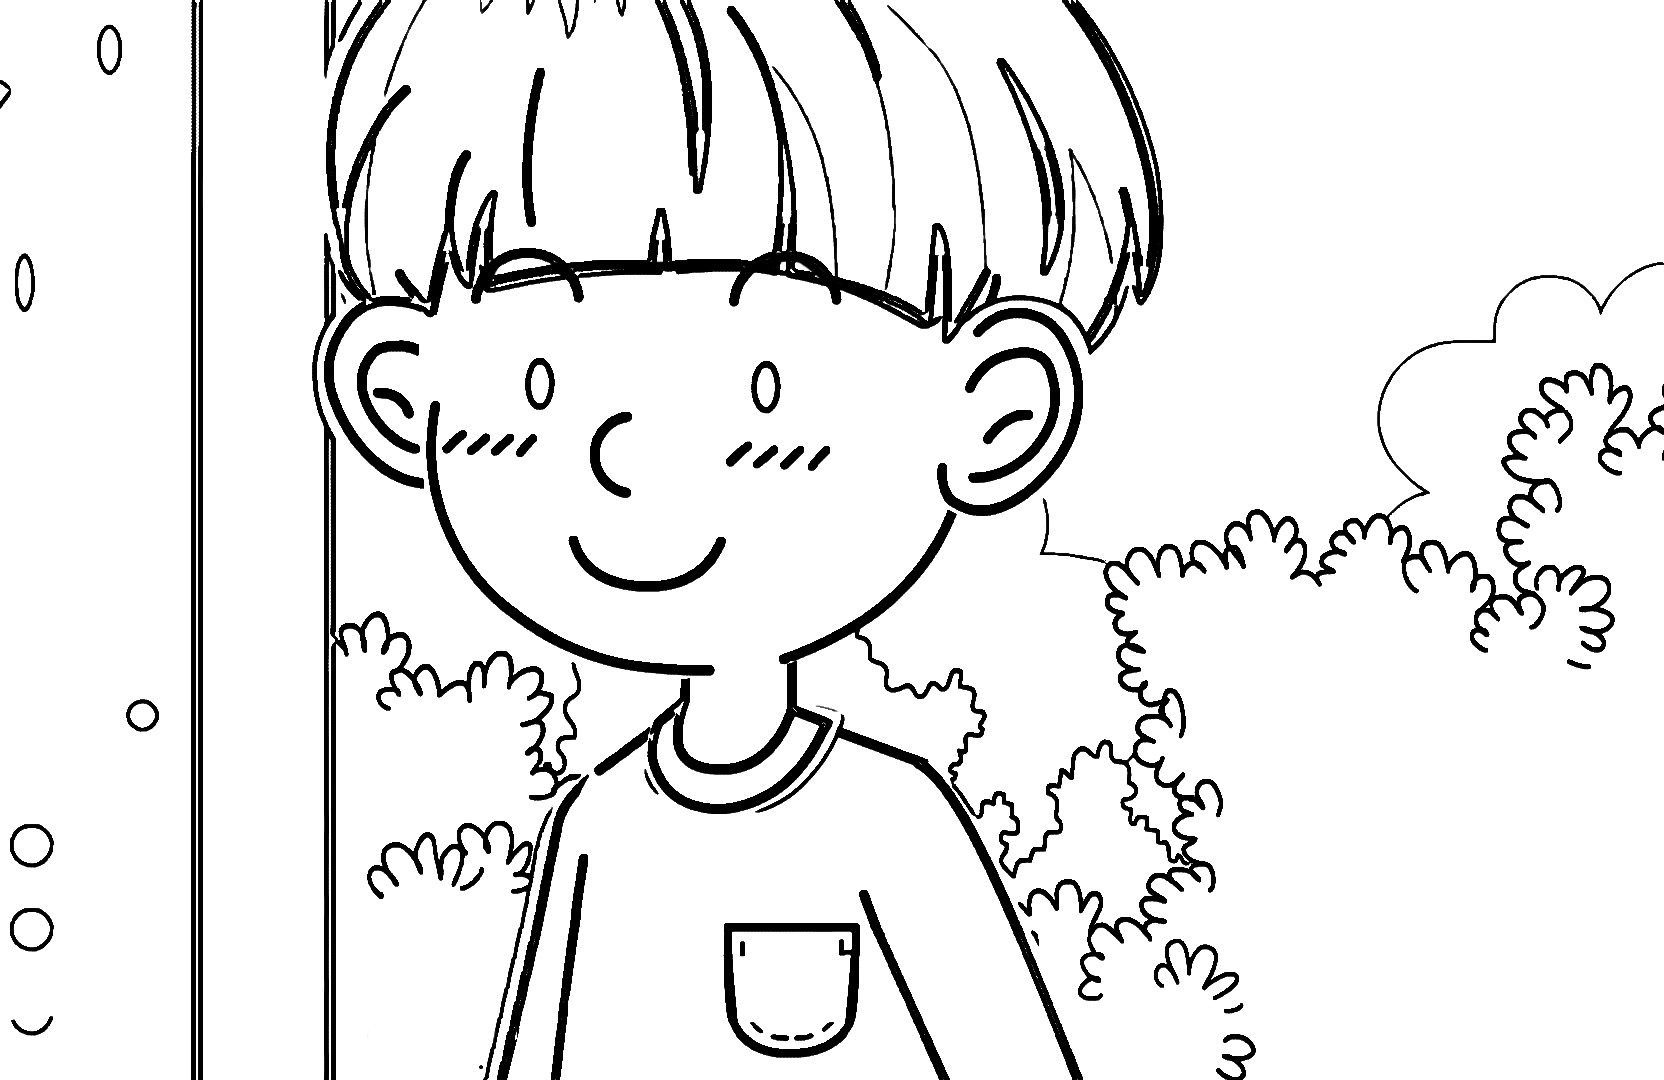 Speaking Cartoon Kids Coloring Page 09